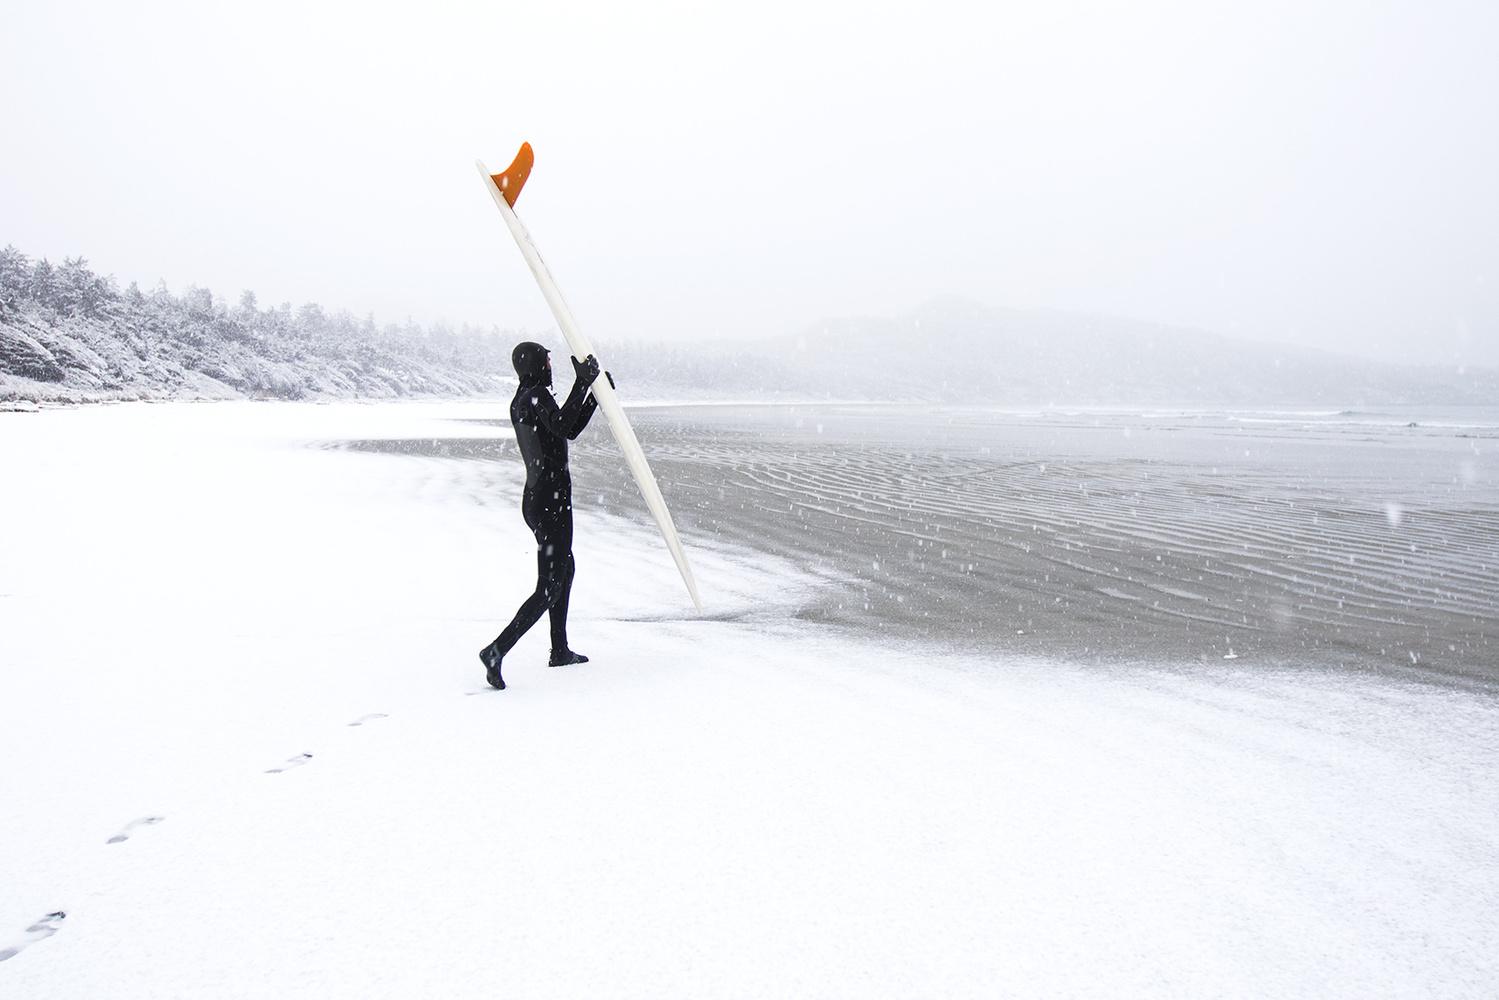 Snow Day by Marcus Paladino